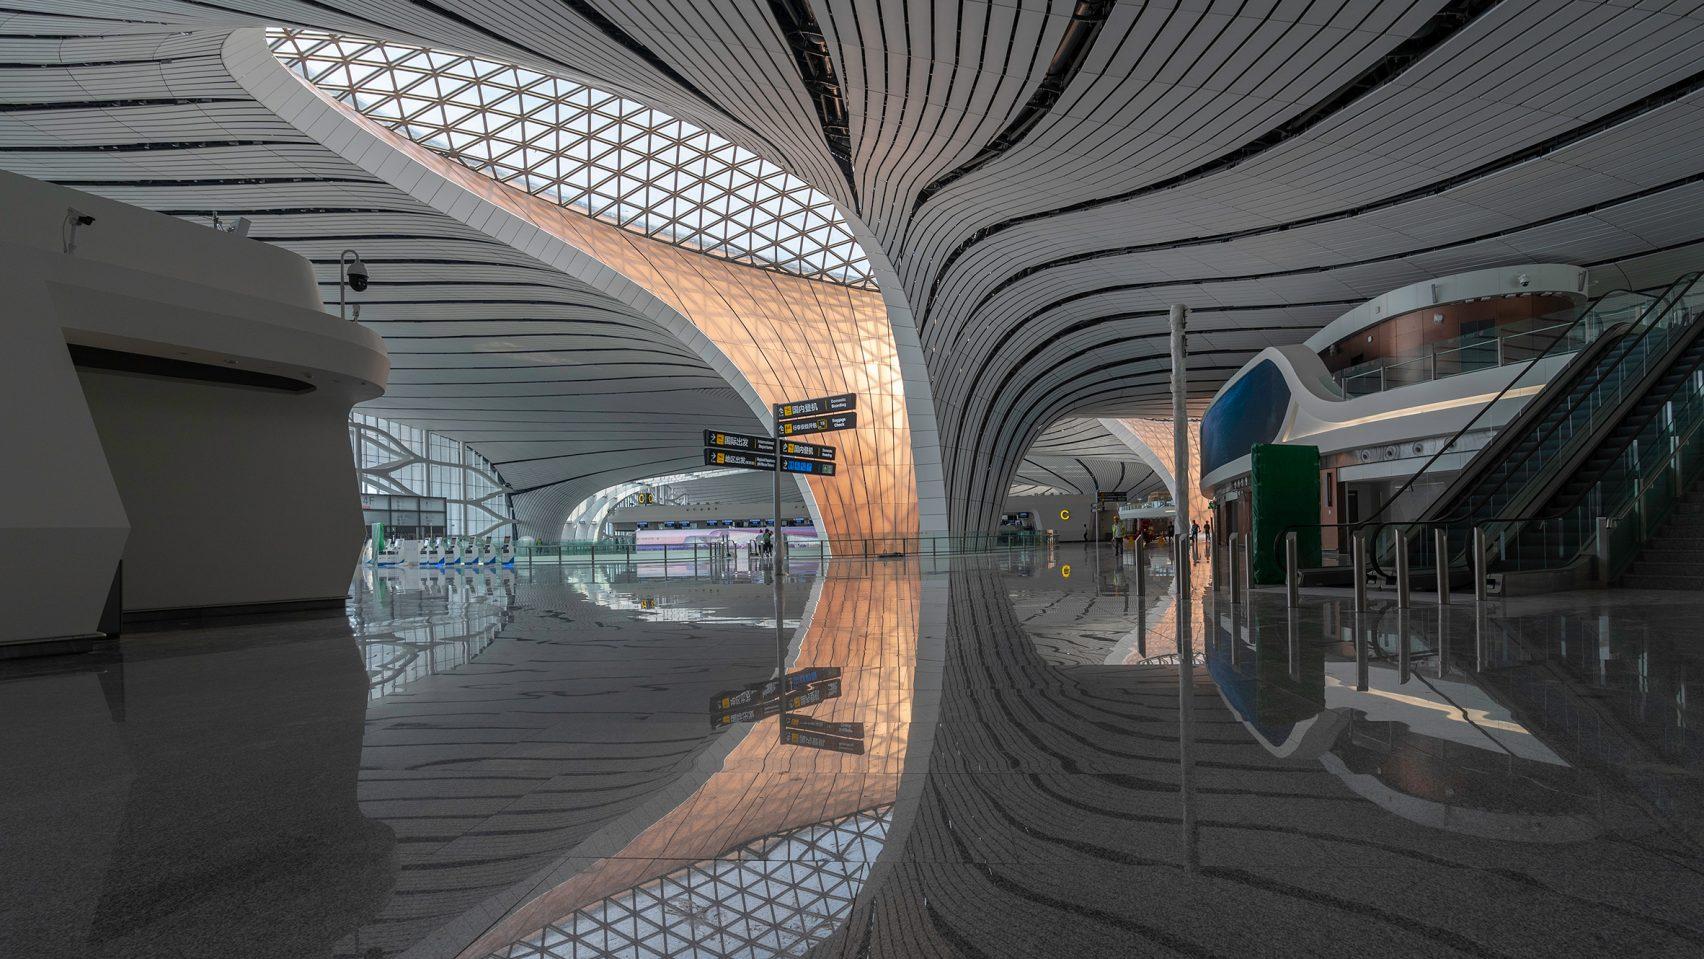 Zaha Hadid Architects' Beijing Airport Project Unveiled zaha hadid architects Zaha Hadid Architects' Beijing Airport Project Unveiled Beijing Daxing International Airport Zaha Hadid CGTN dezeen 03 1704x959